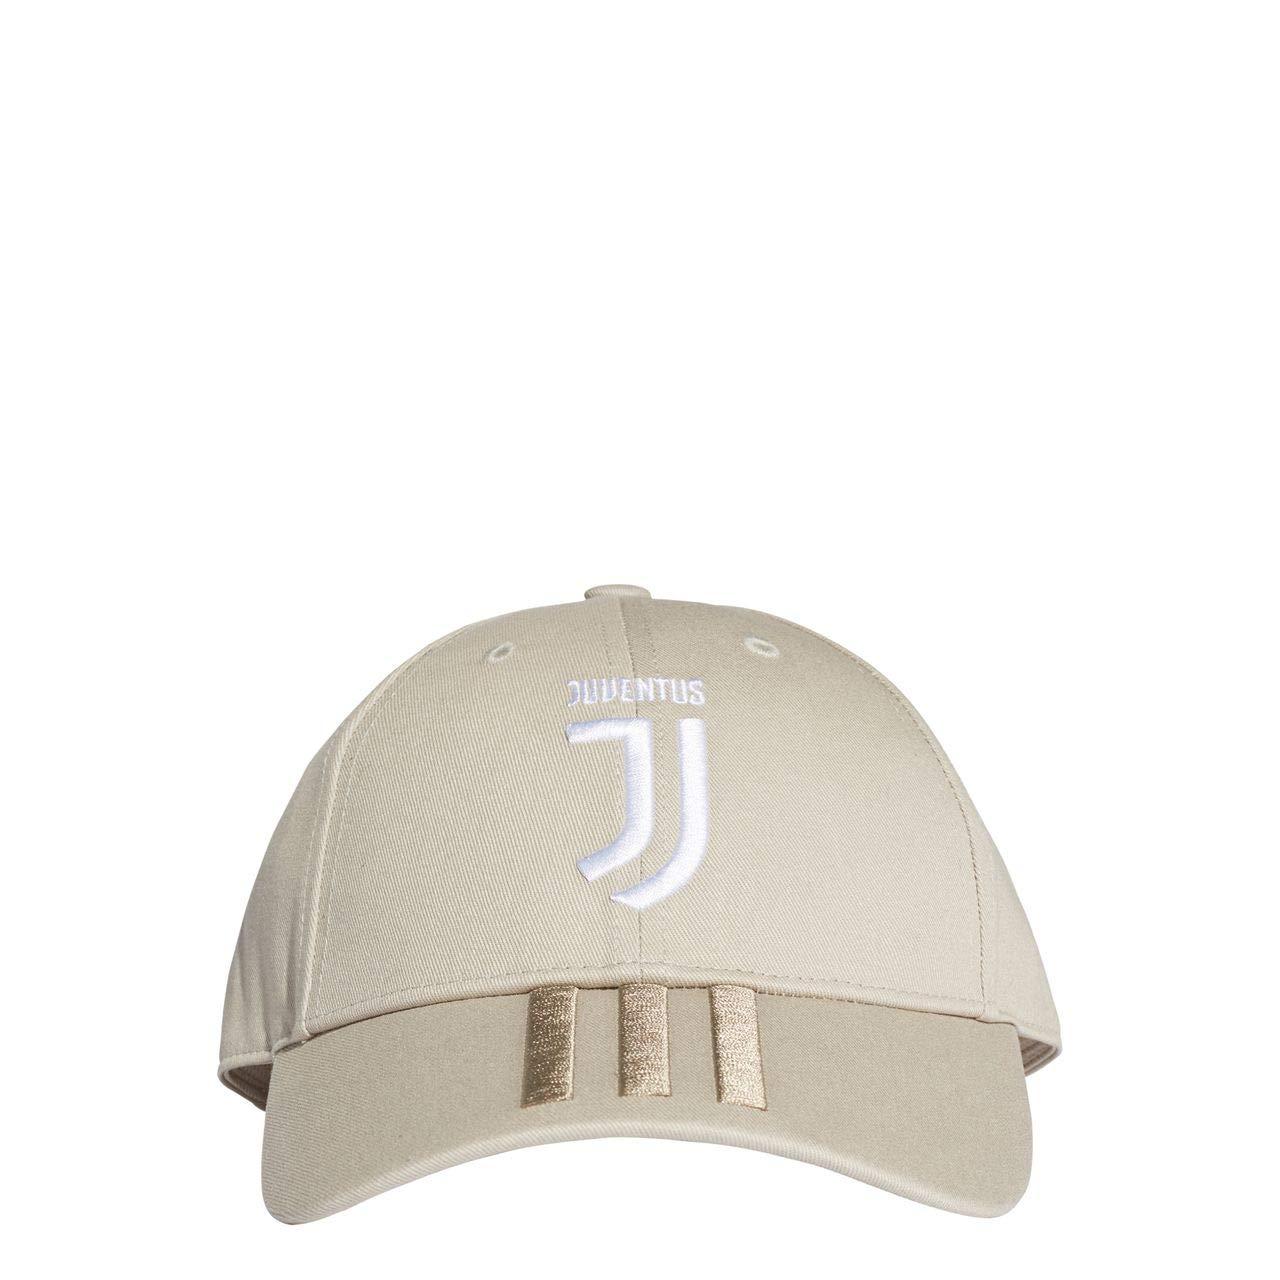 usa cheap sale get online no sale tax Amazon.com: adidas Soccer Cap Juventus Hat One Size Beige ...